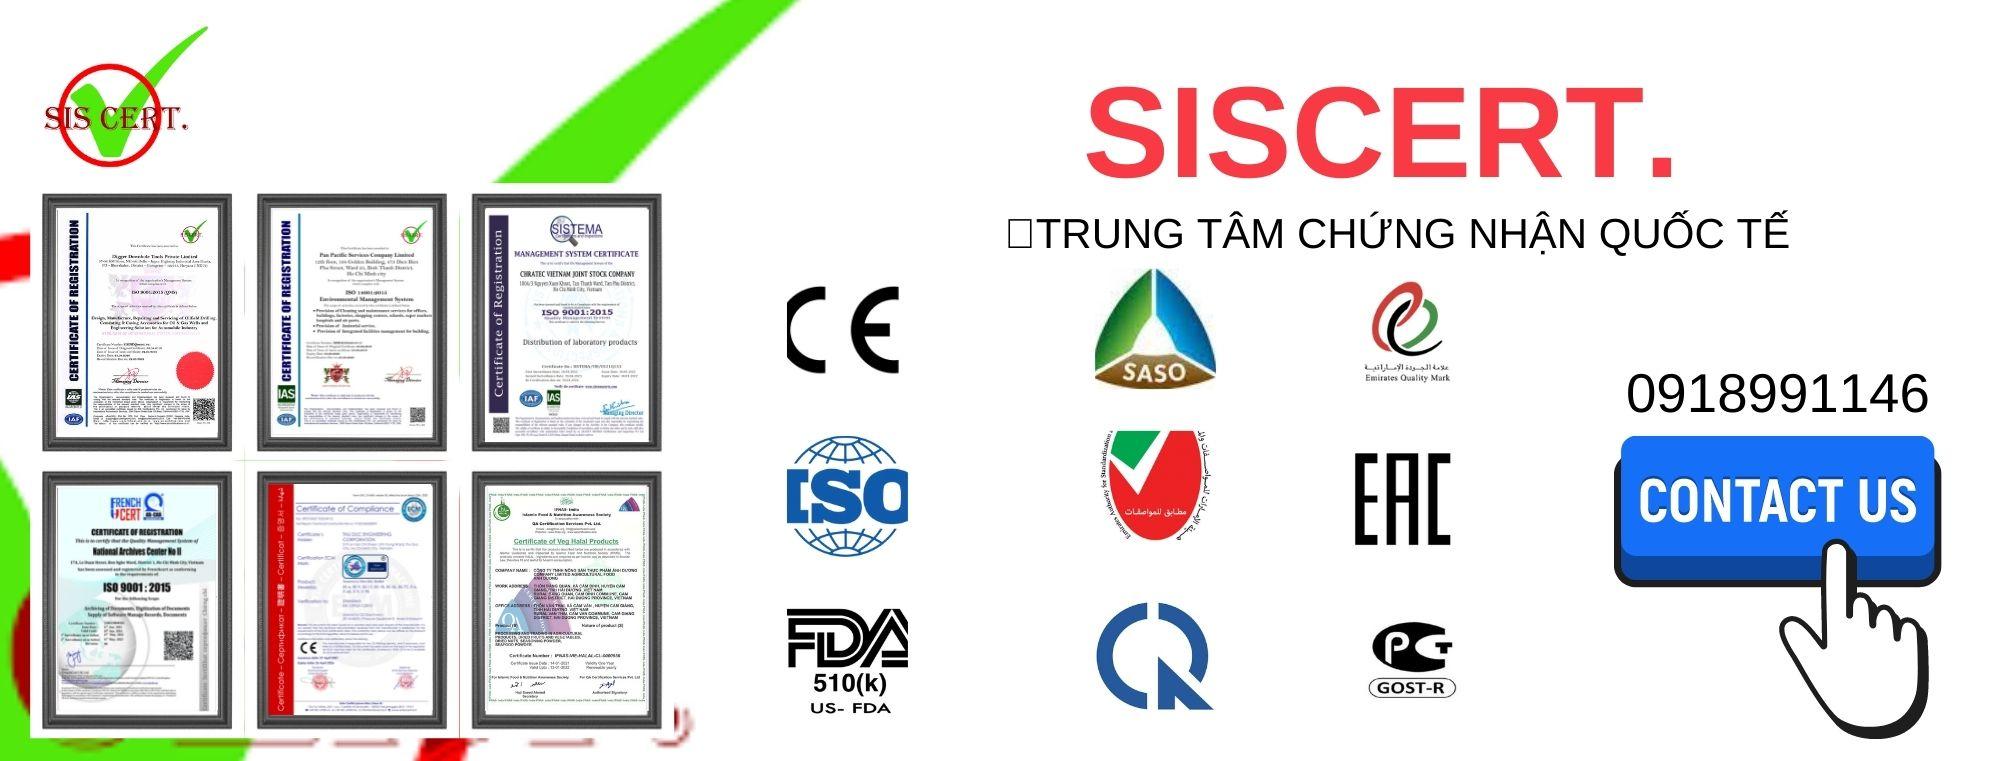 Chứng nhận ISO, CE, FDA,